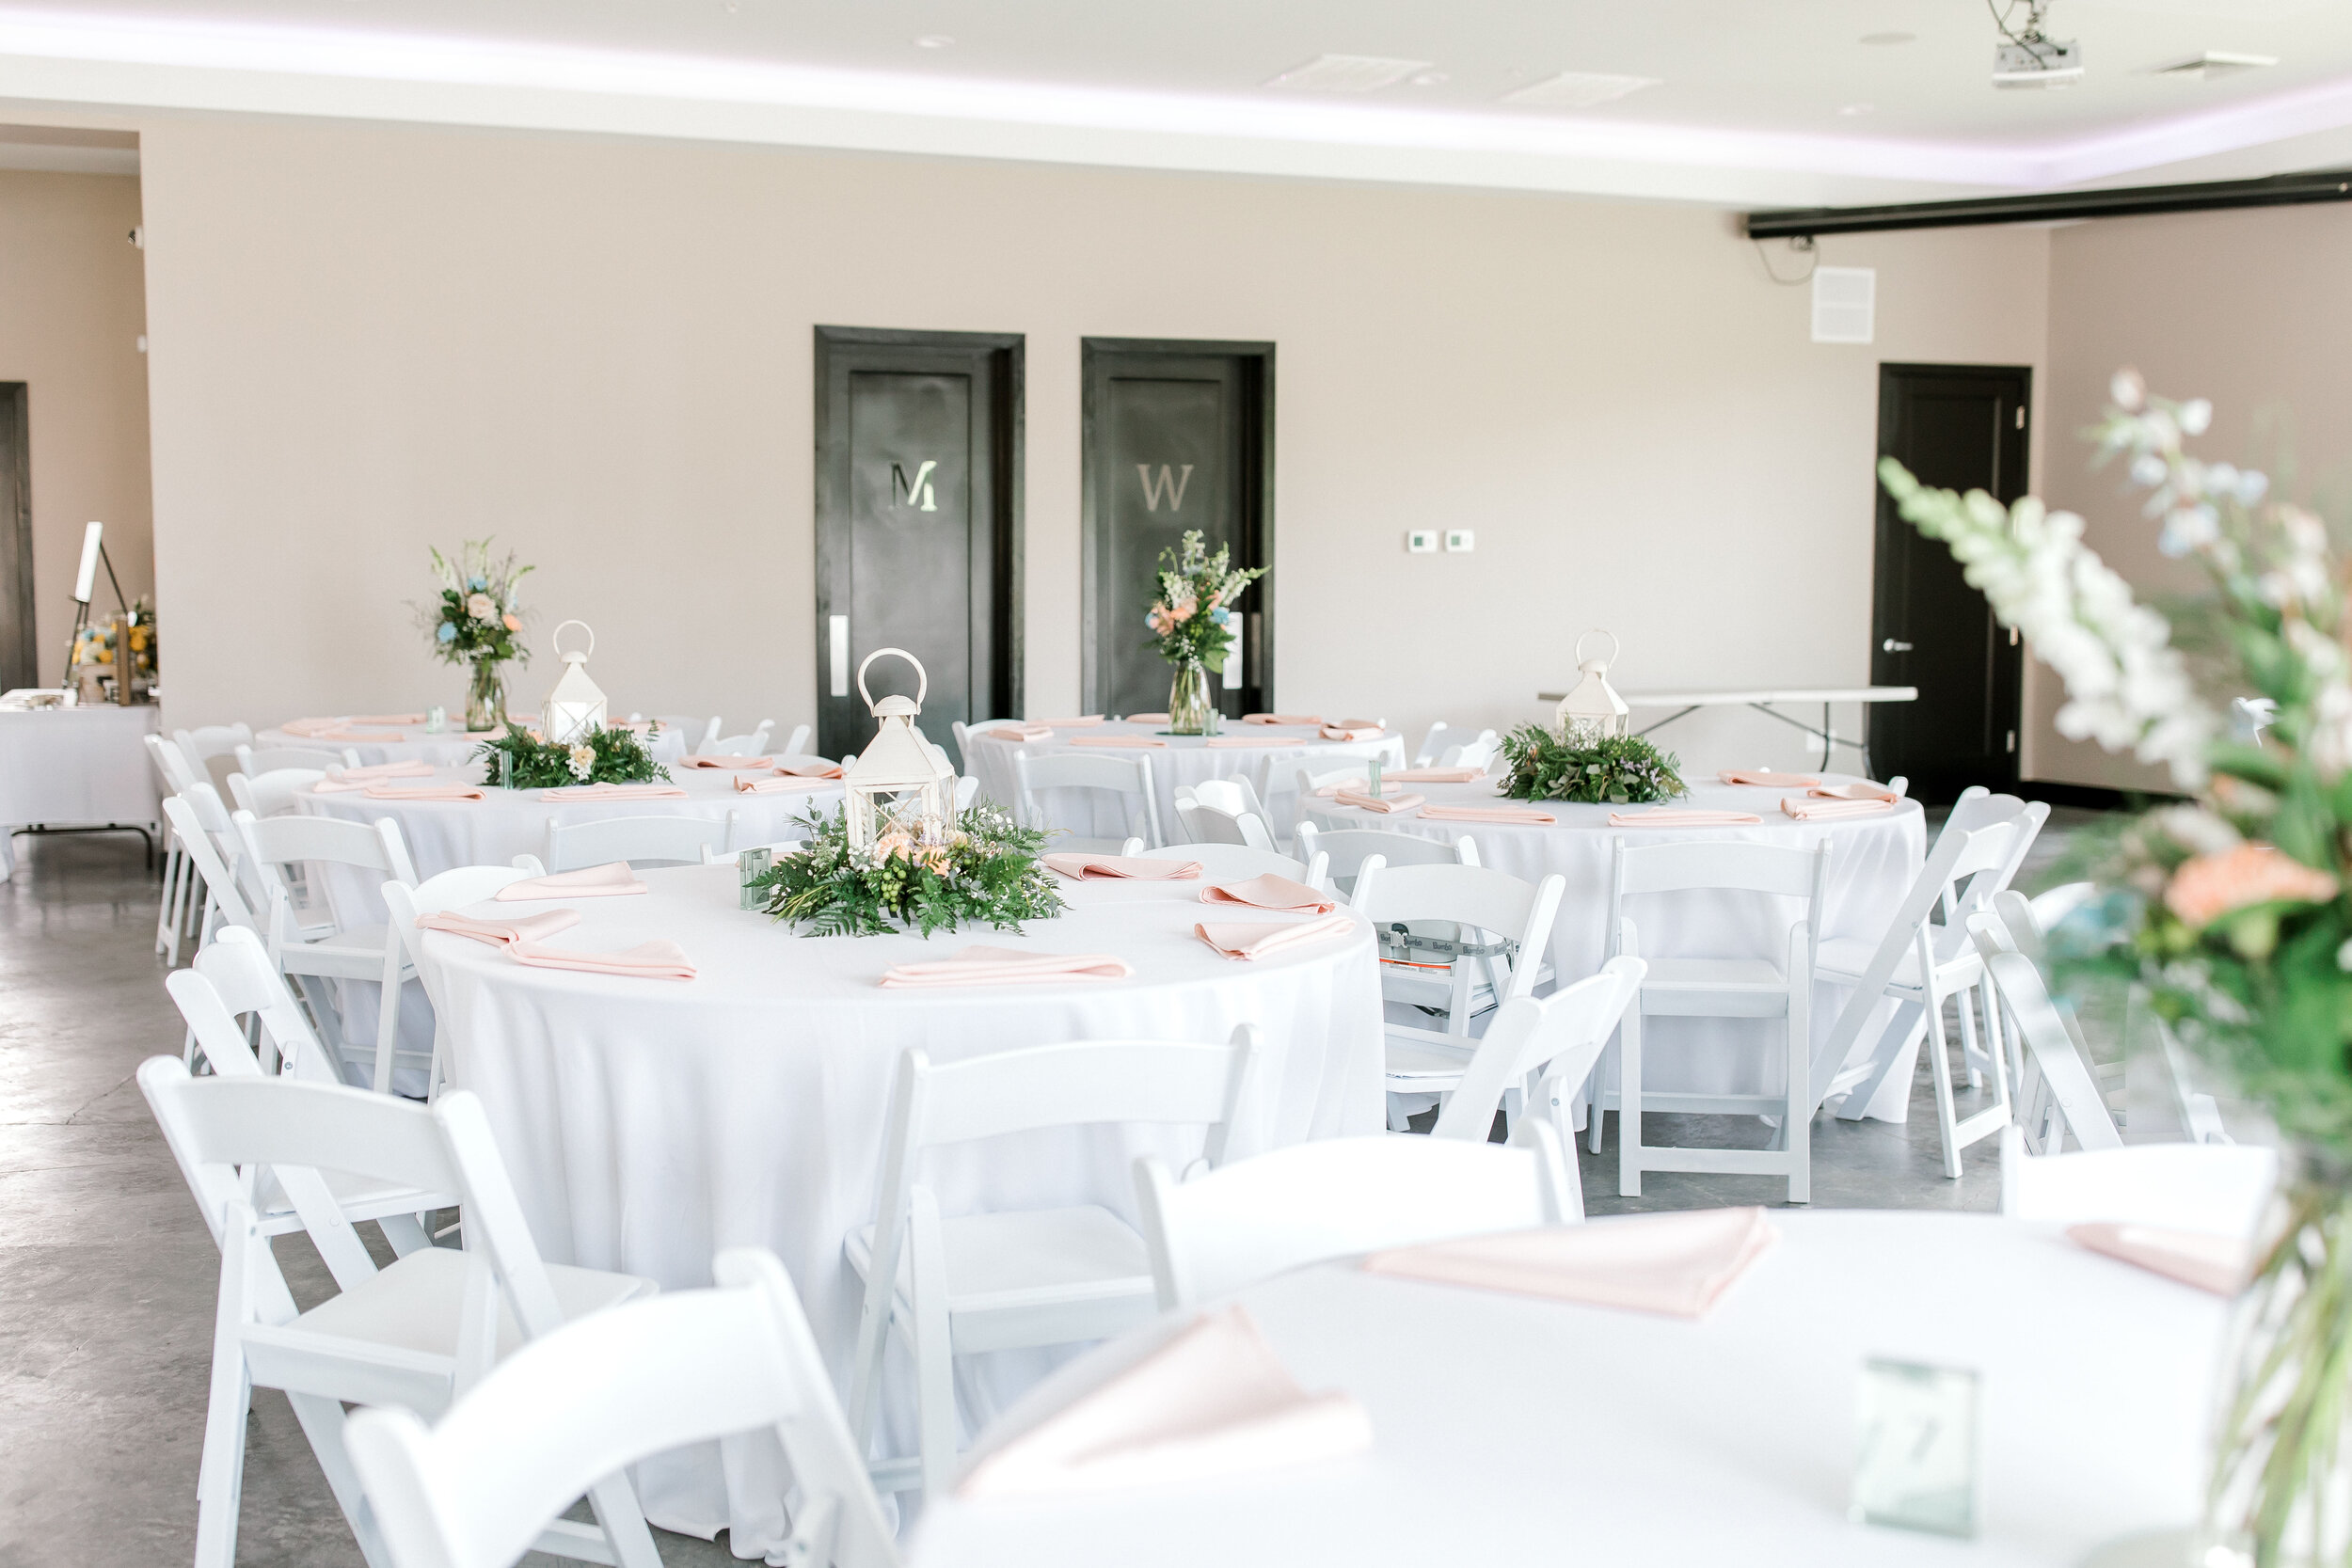 060119_Wedding_Brittany_Eddie_SS (155 of 354).jpg